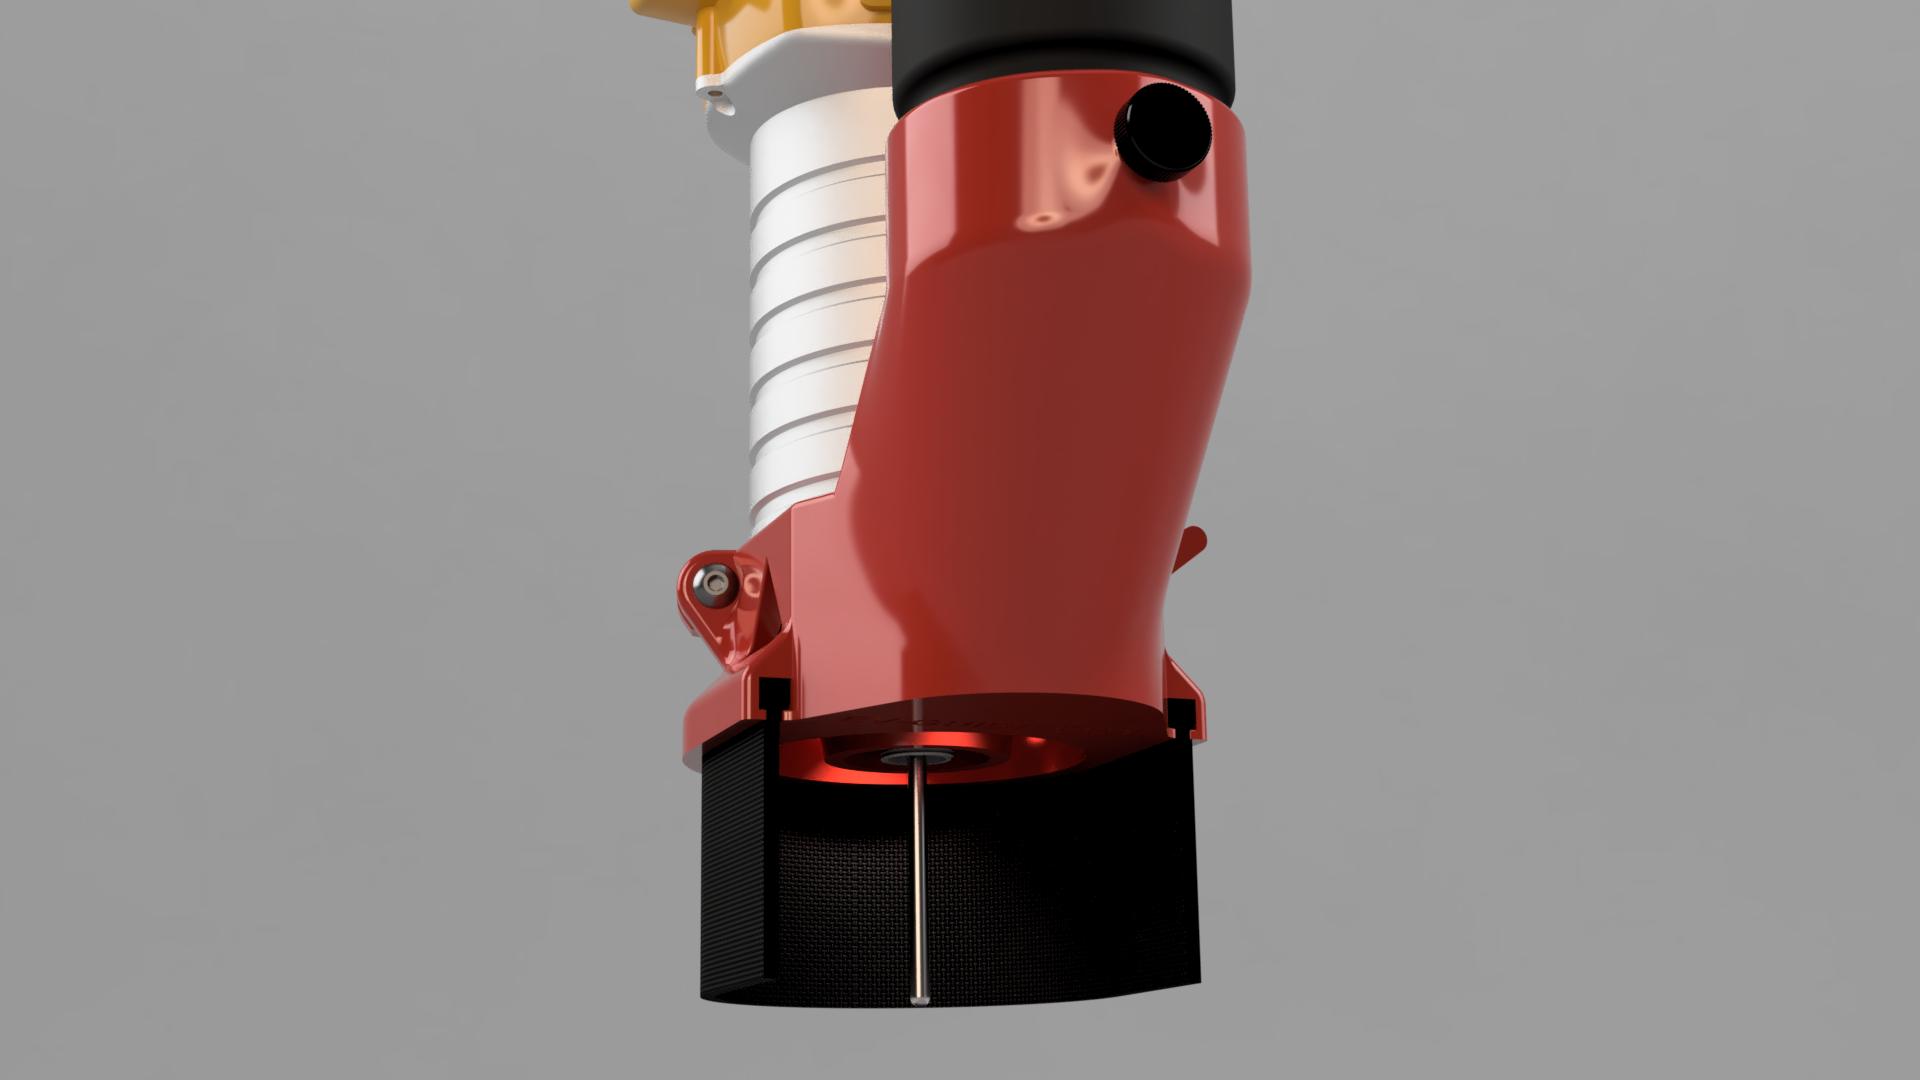 Dewalt_Vacuum_Adapter_FinalA.png